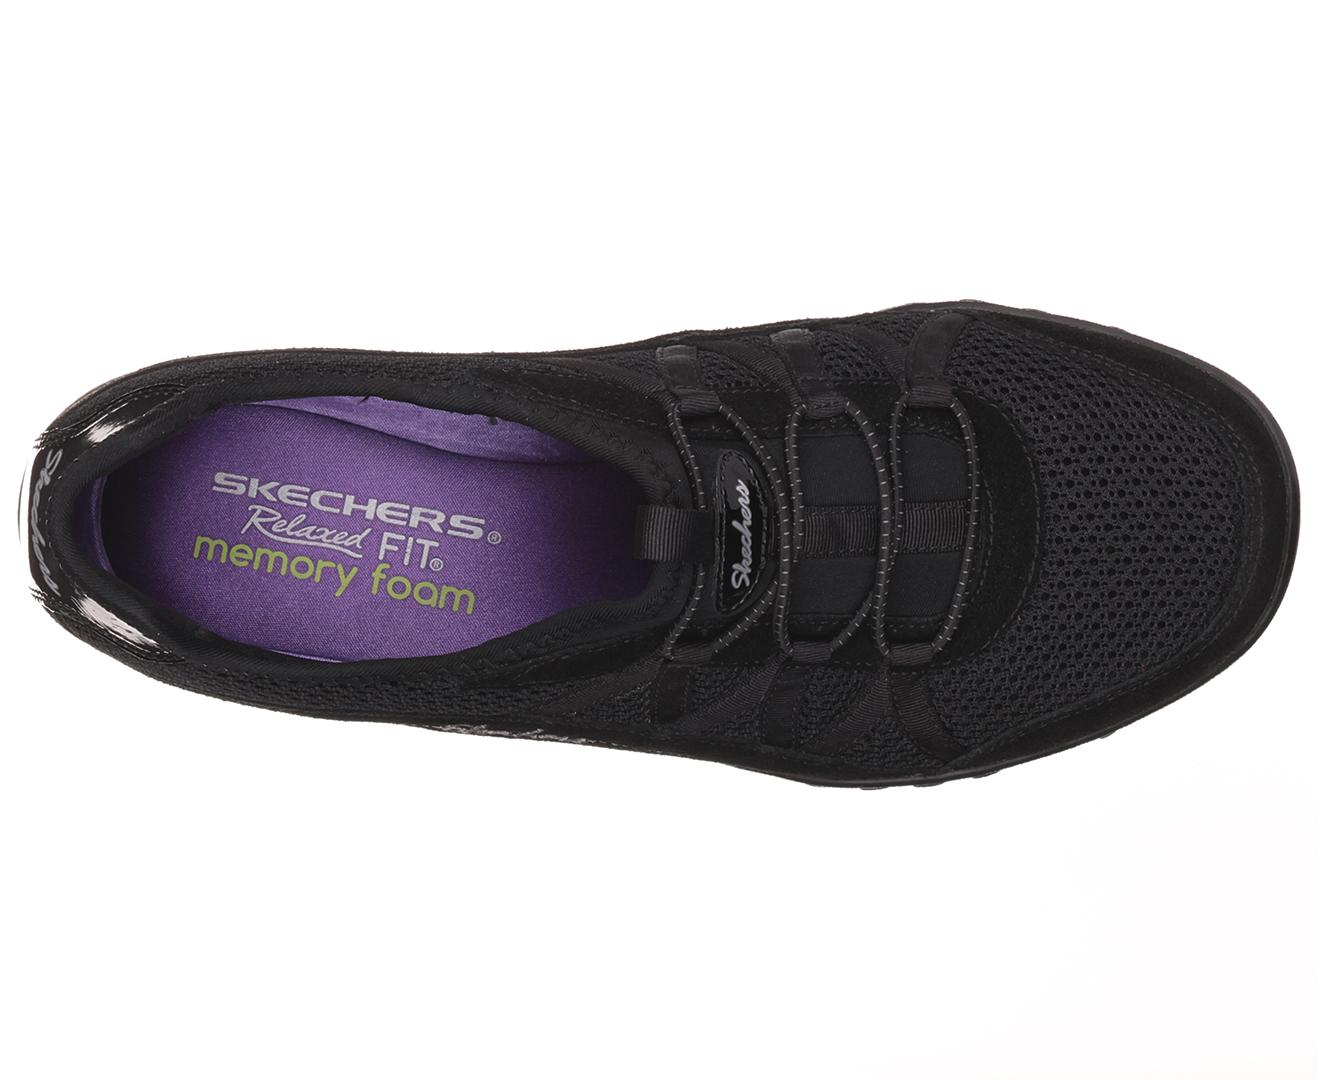 b15d793c0bb6 Skechers Women s Breathe Easy Relaxation Relaxed Fit Shoe - Black ...